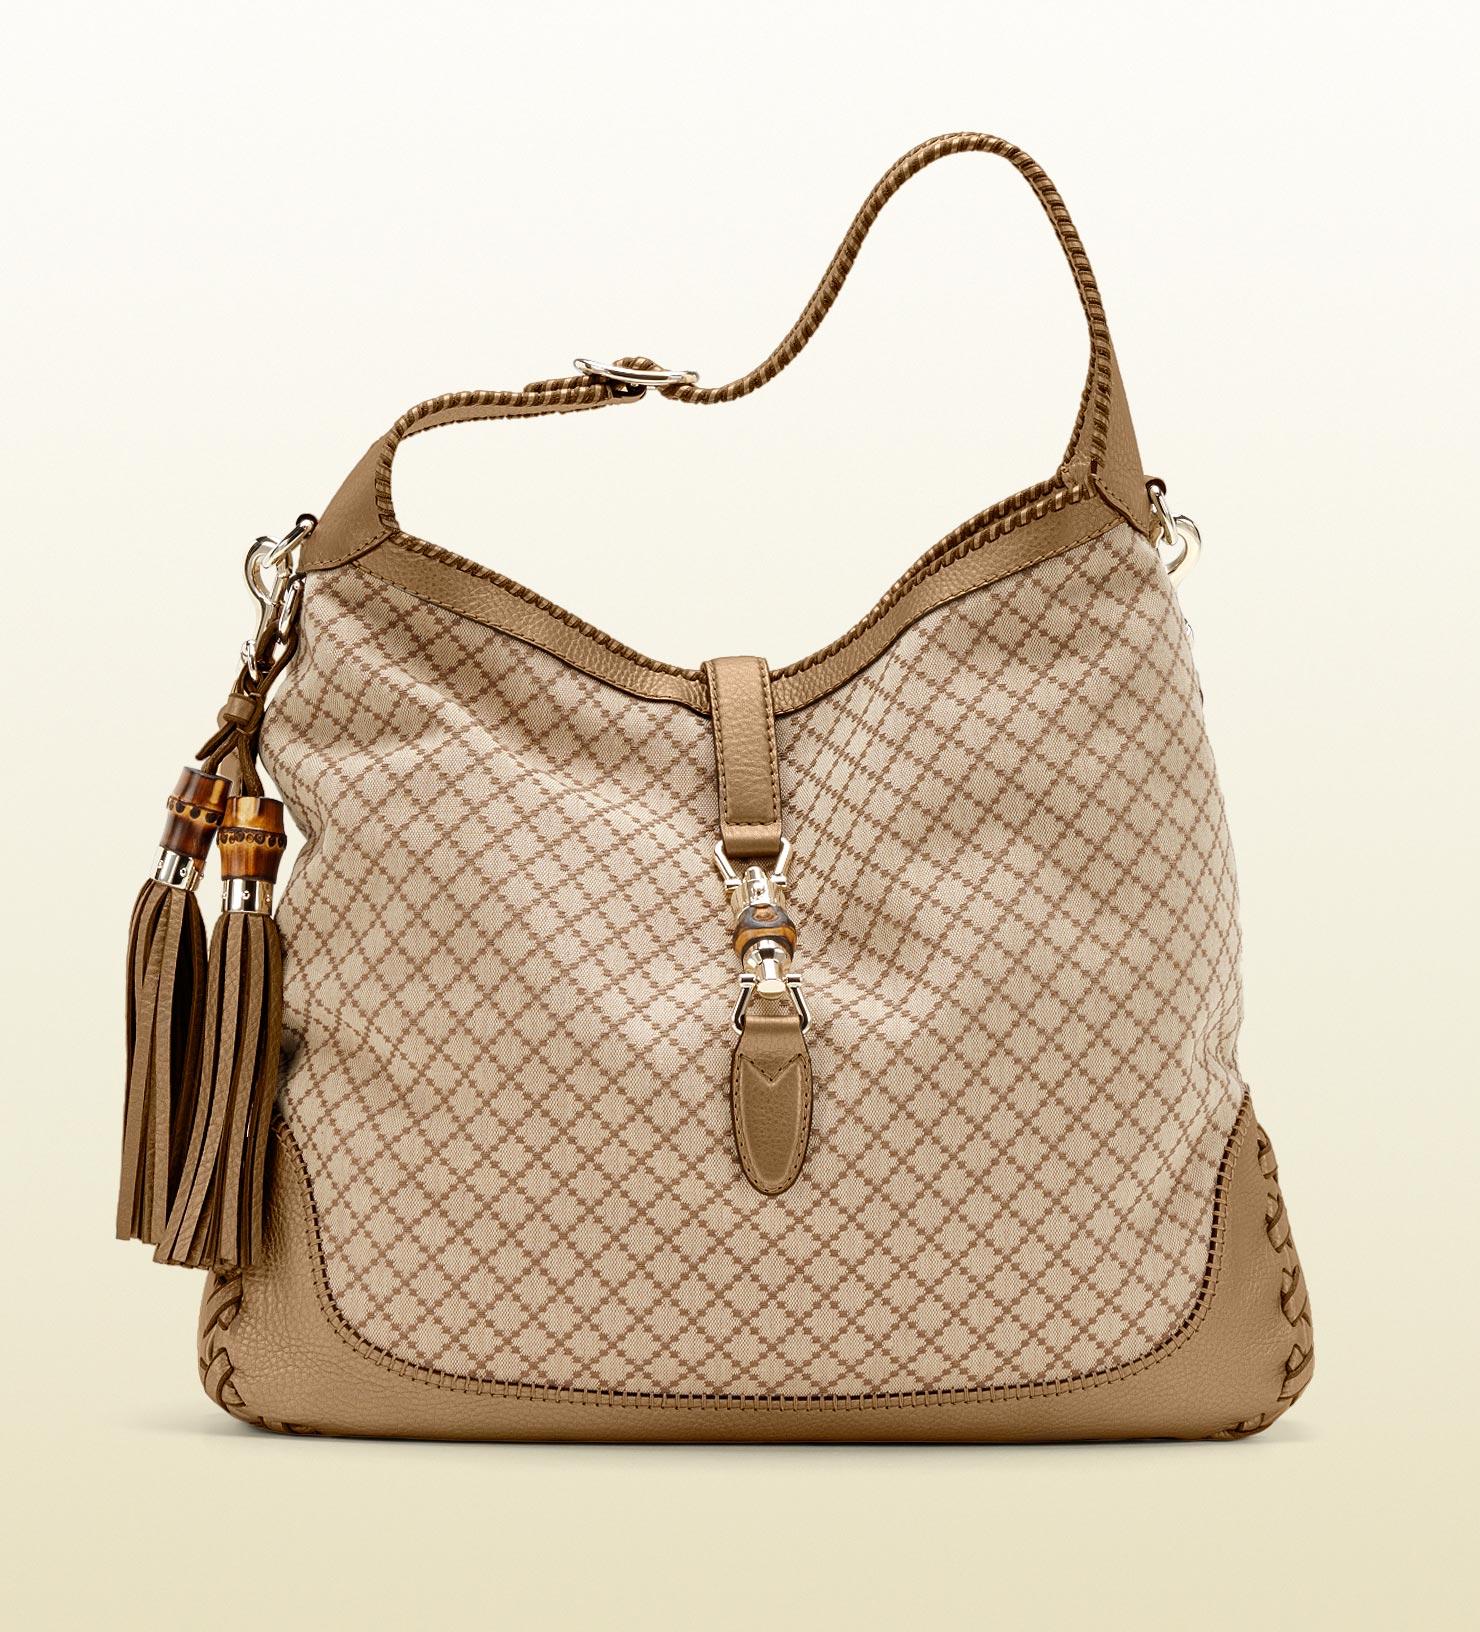 3d96096549cf7c Gucci New Jackie Diamante Canvas Shoulder Bag in Natural - Lyst